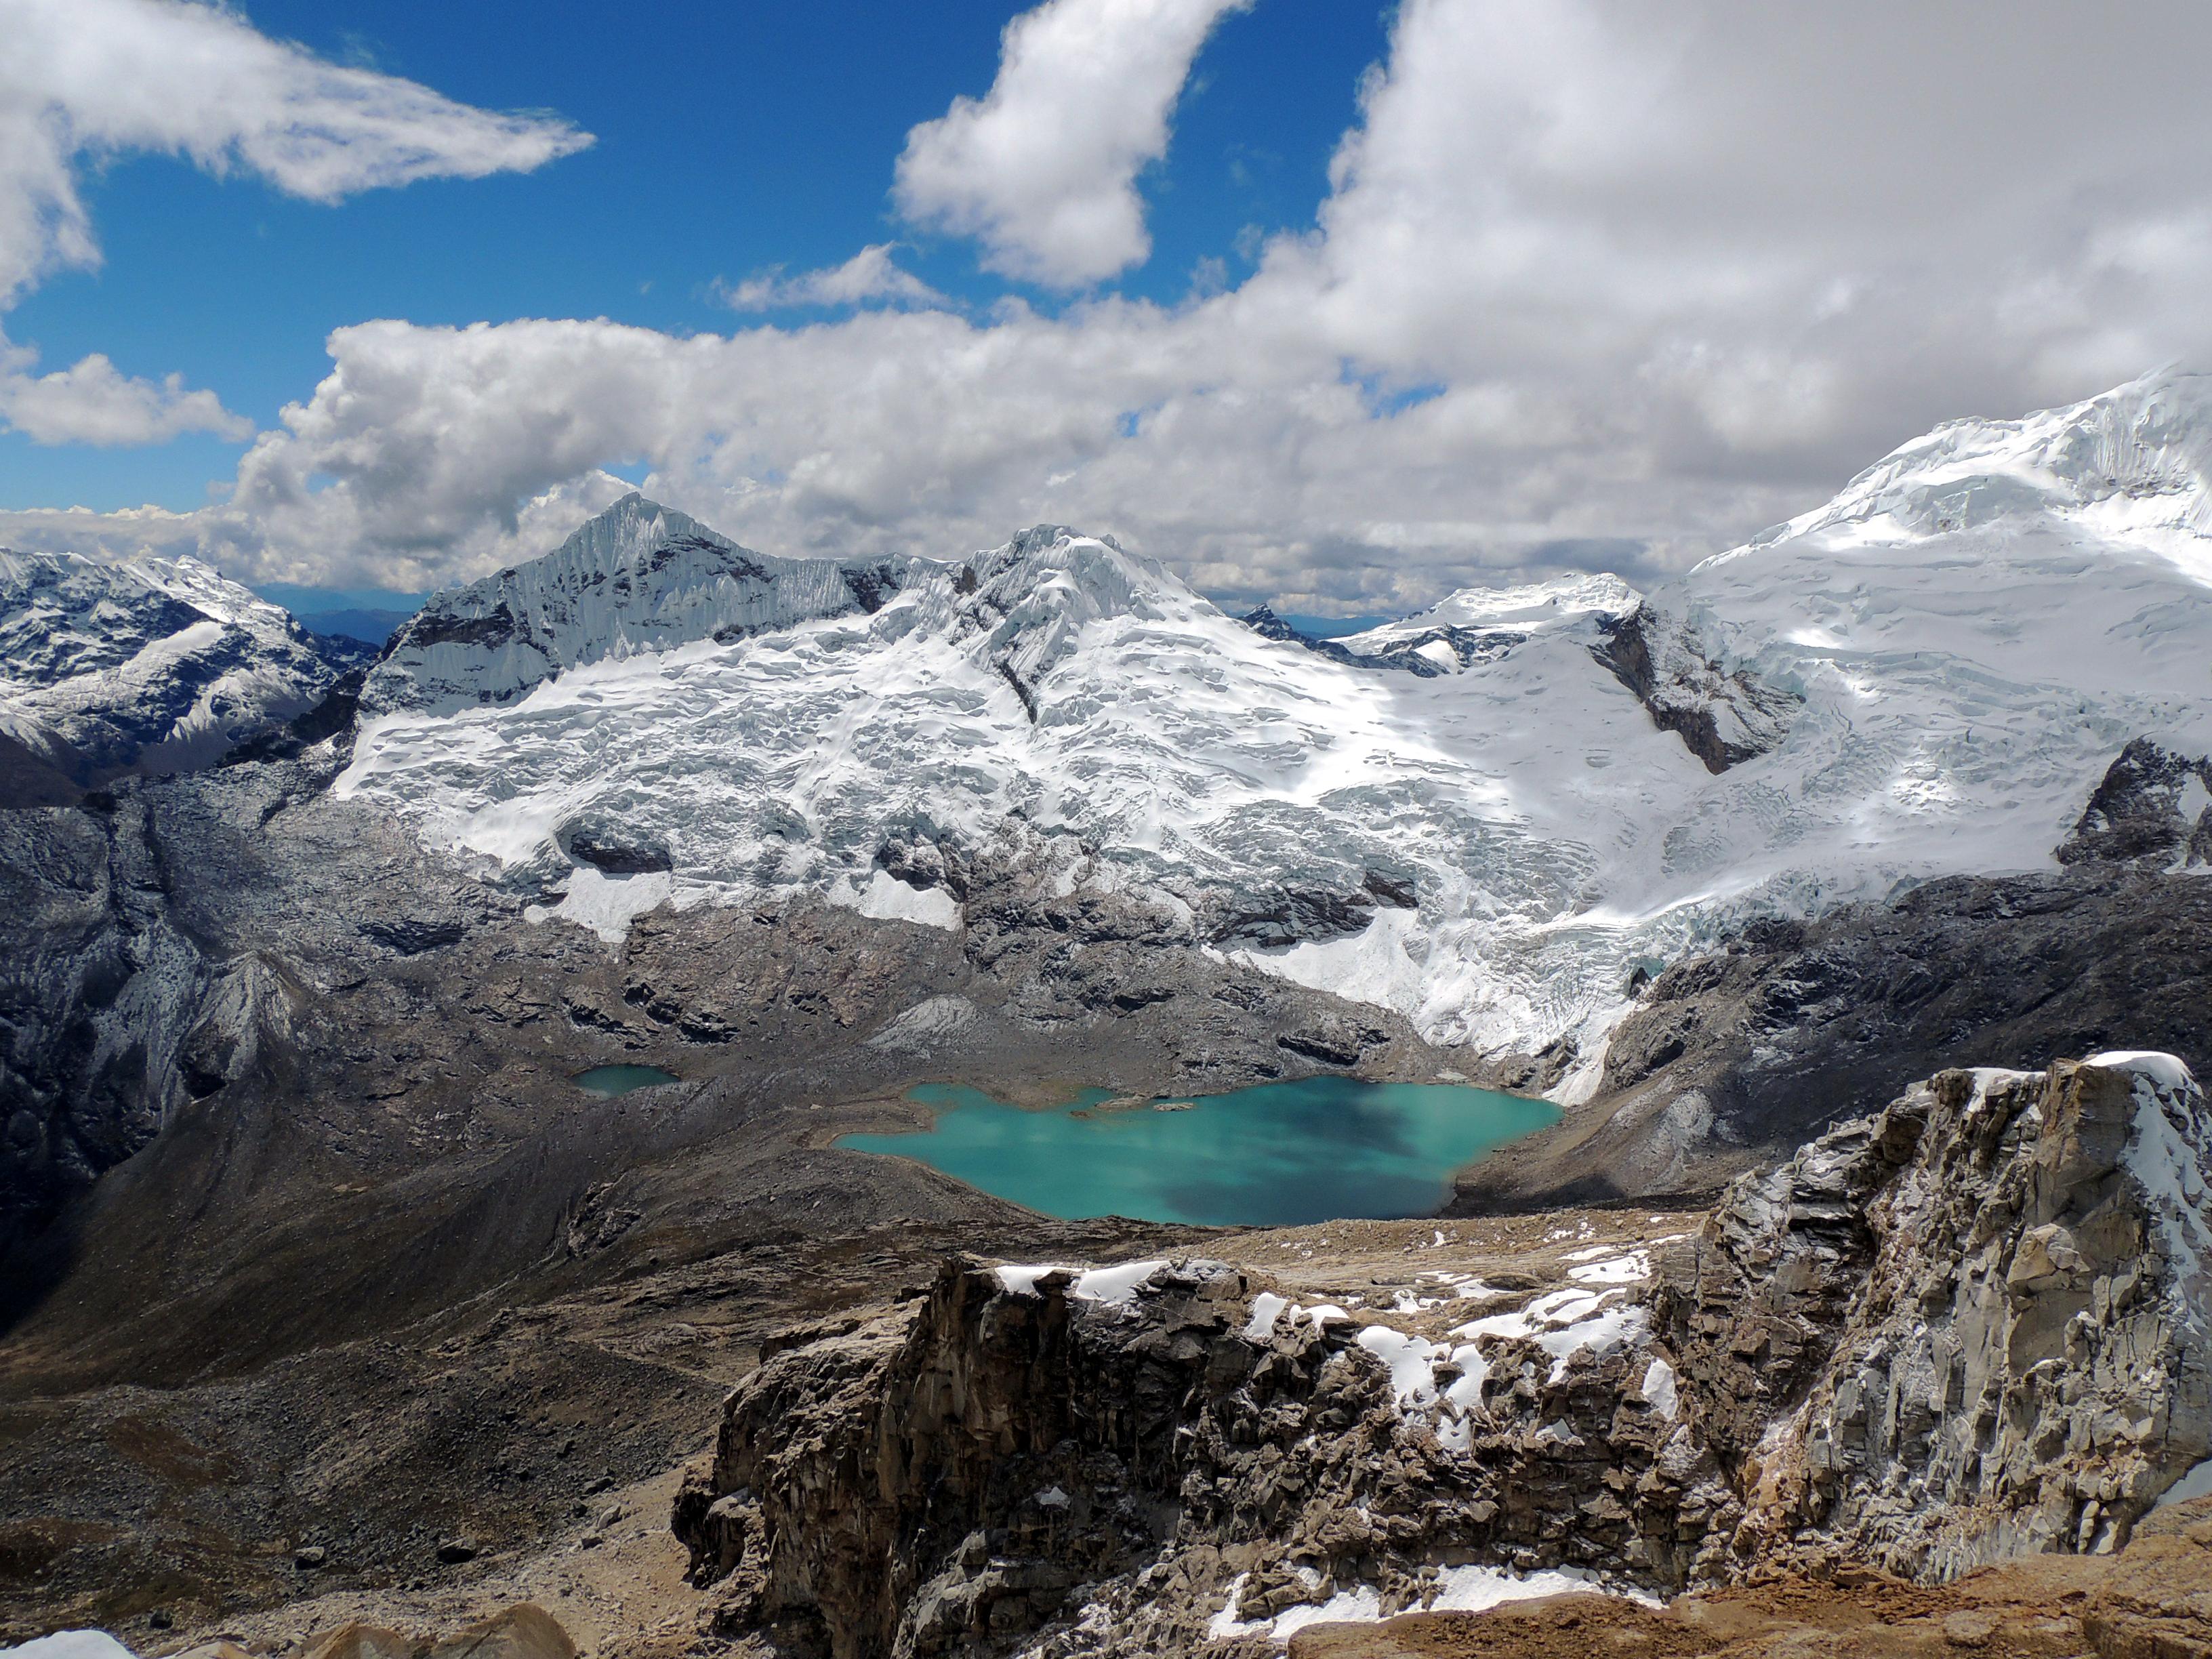 Gletscher im Nationalpark Huascarán, Peru